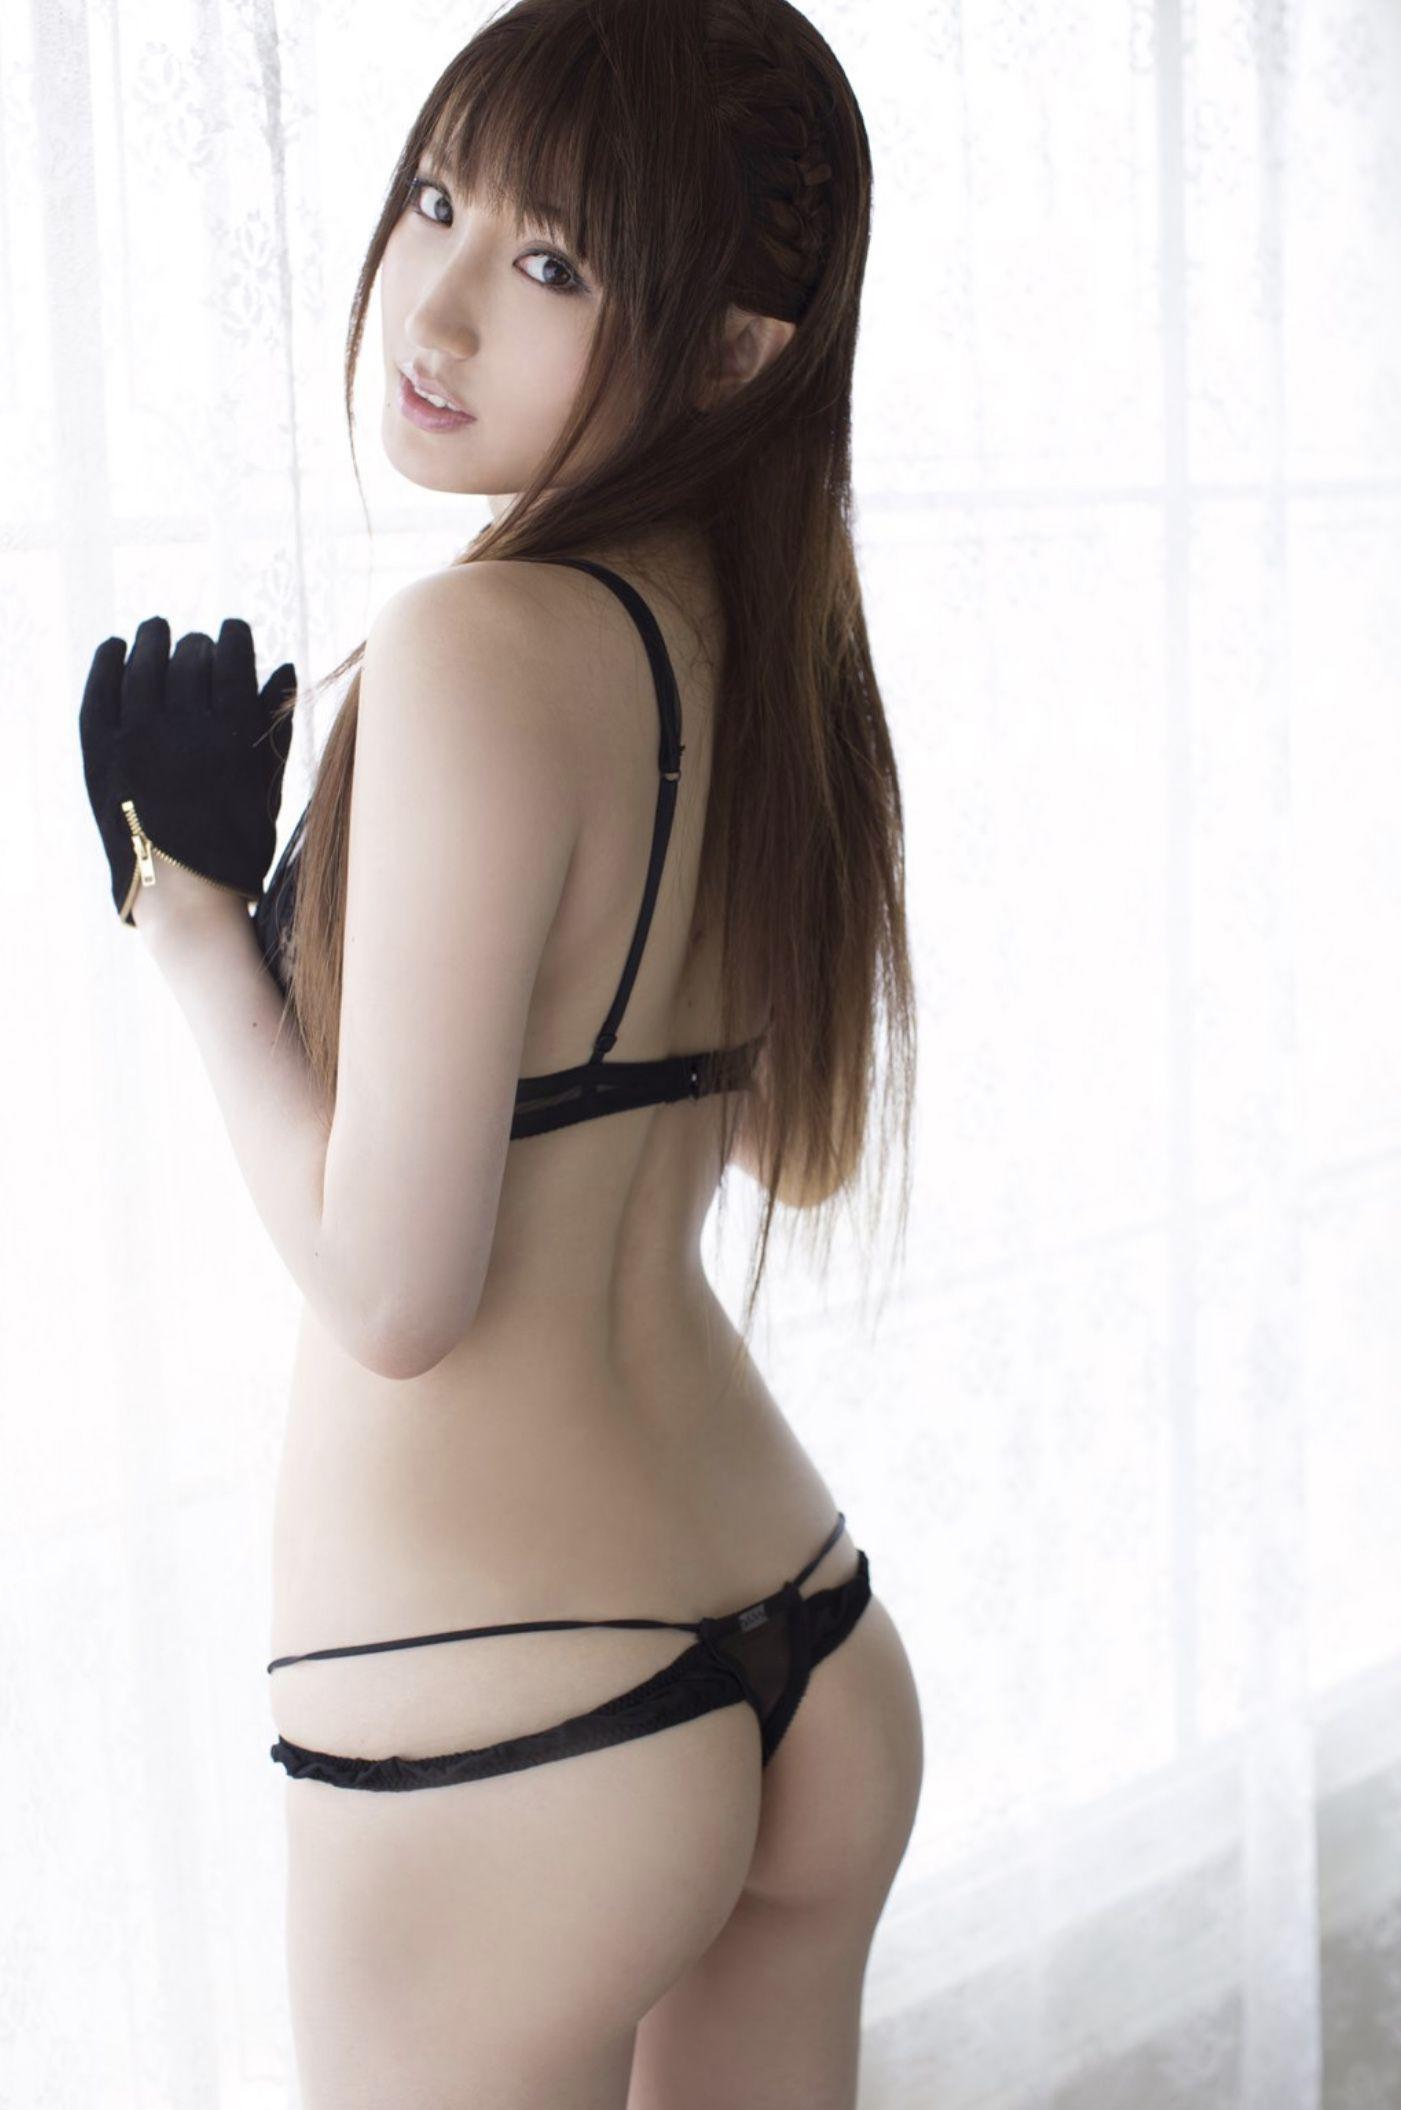 AVデビュー直前ヌード 愛沢かりん photo 007